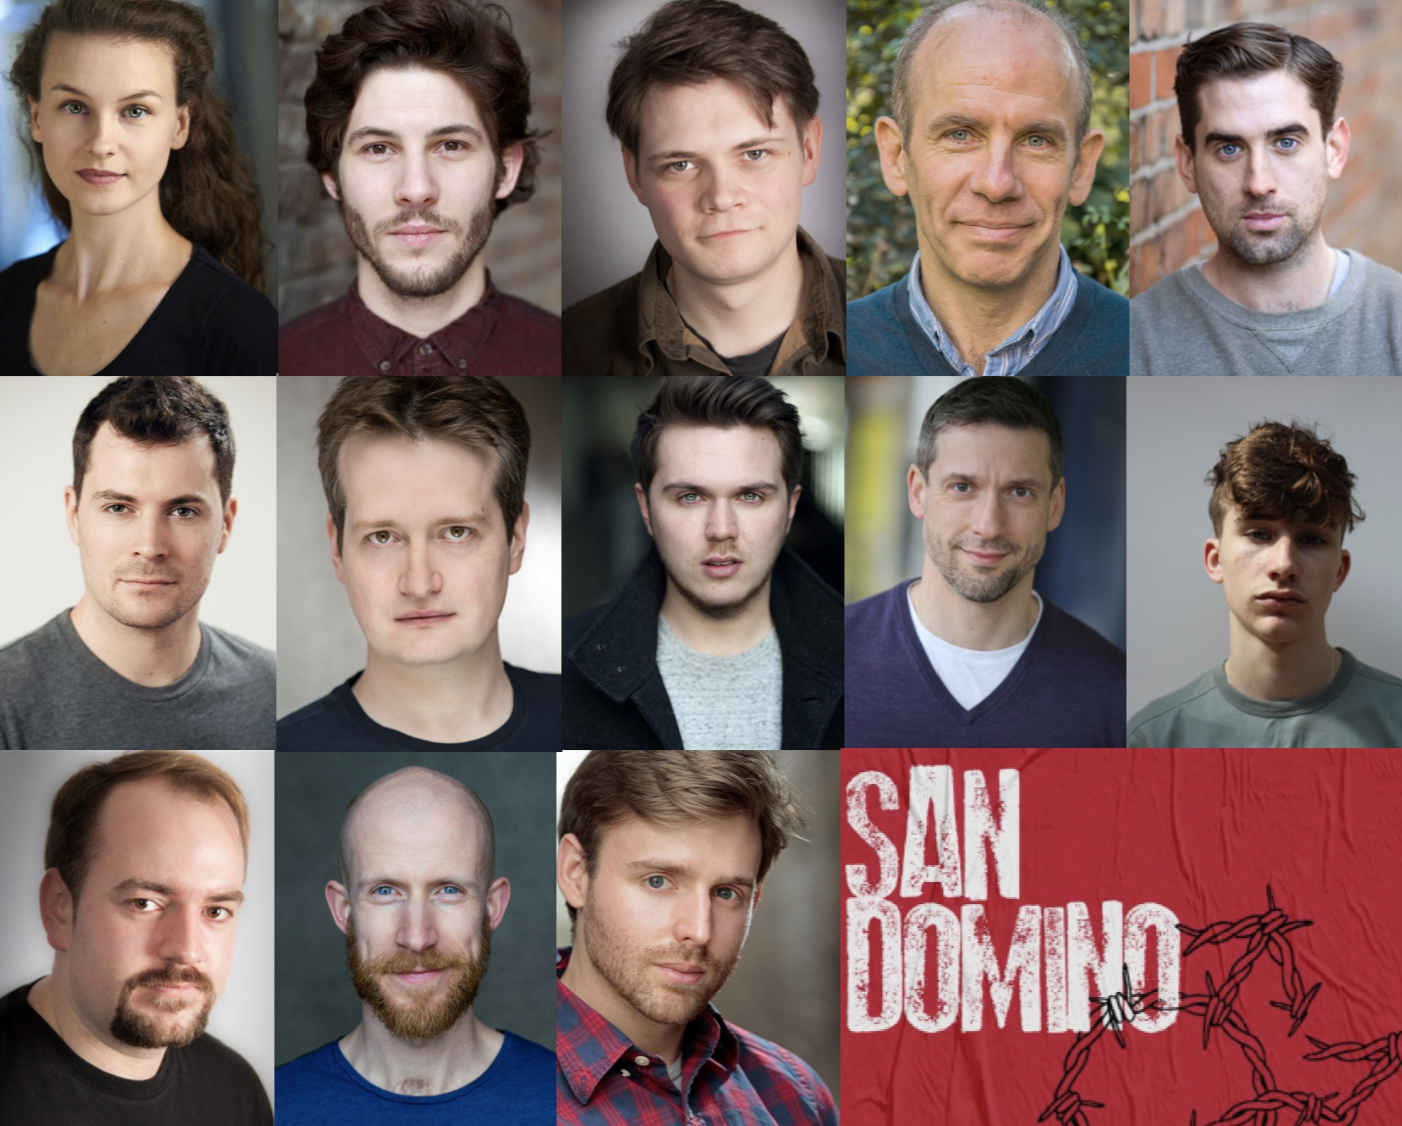 San Domino cast.jpg